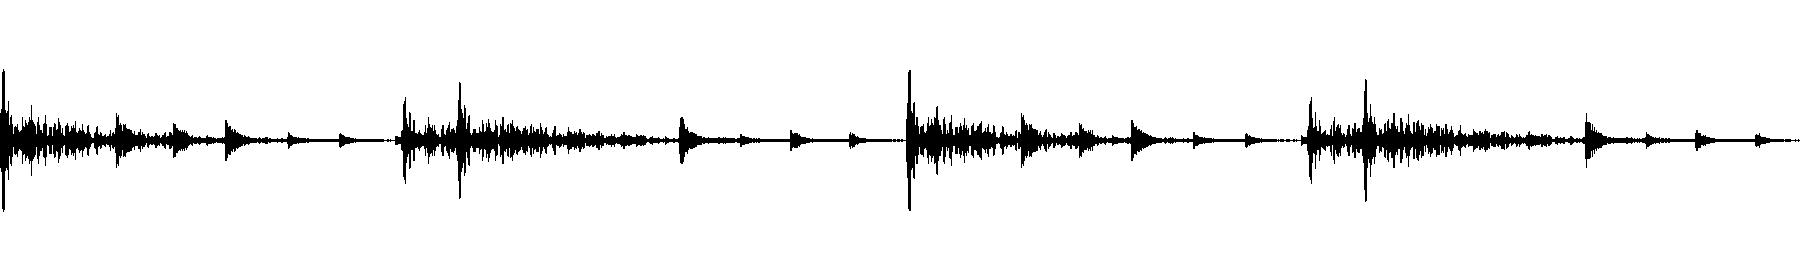 blbc jazzydrums 95 04